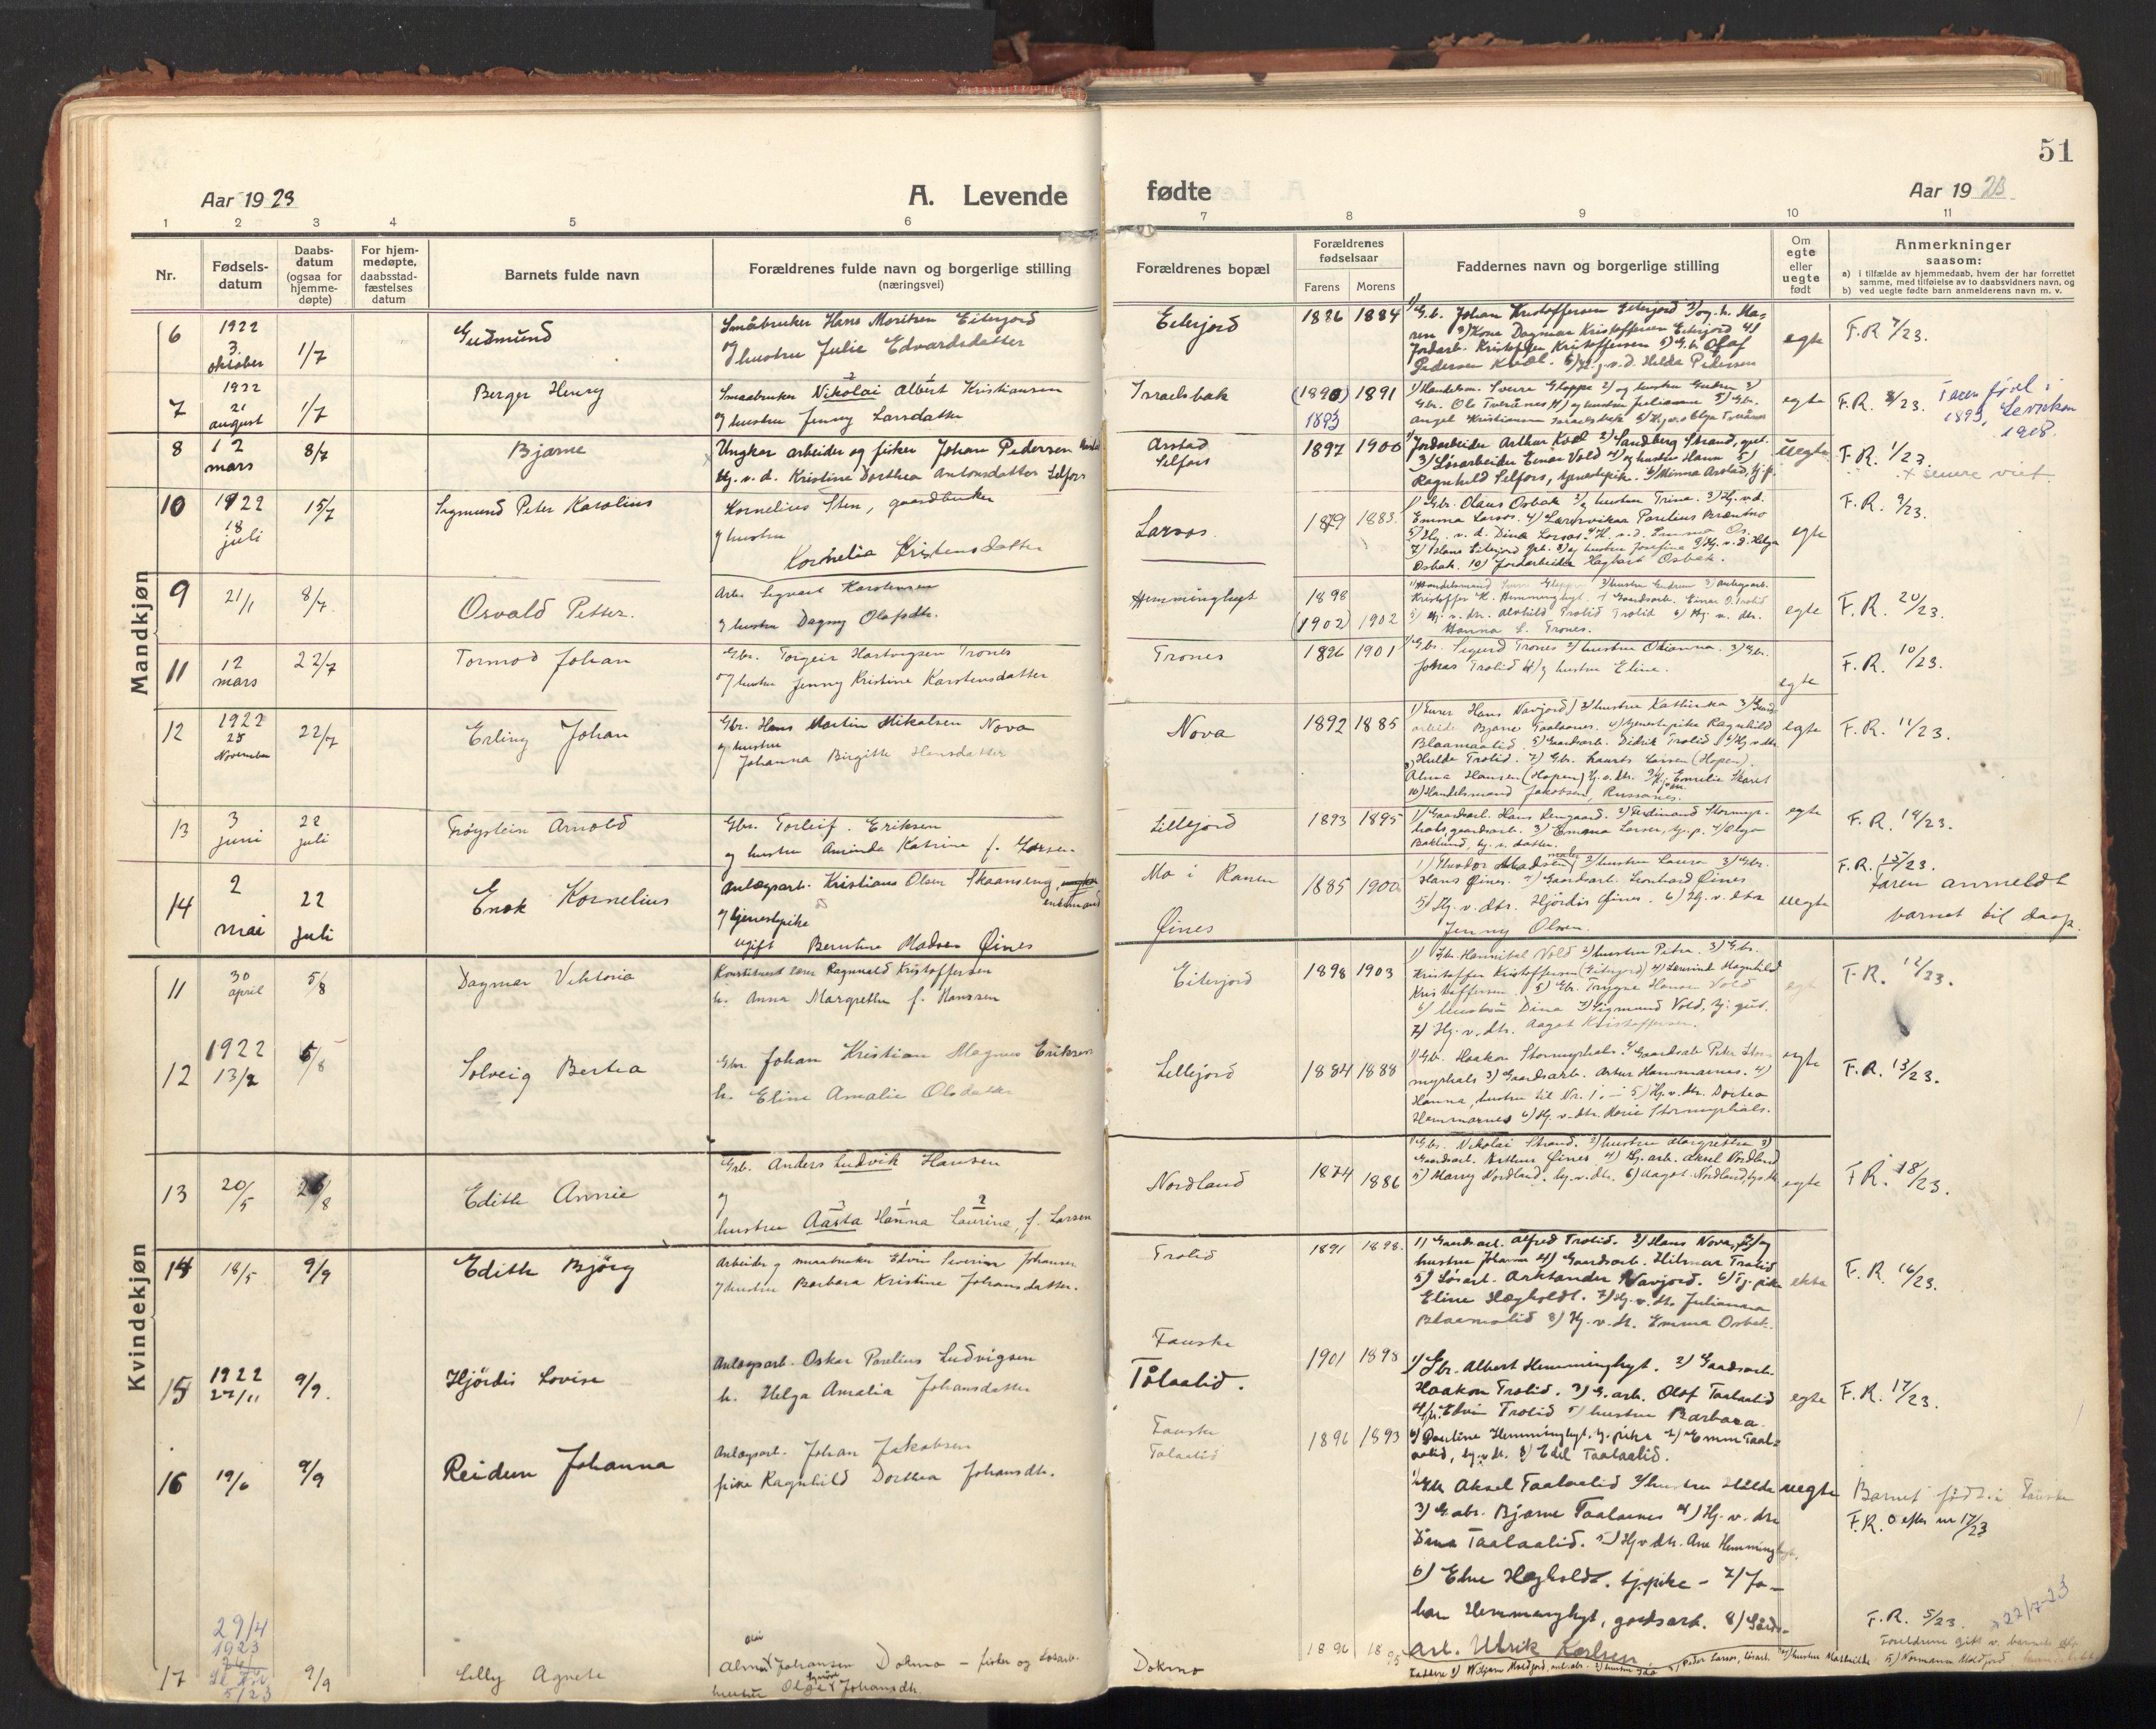 SAT, Ministerialprotokoller, klokkerbøker og fødselsregistre - Nordland, 846/L0650: Ministerialbok nr. 846A08, 1916-1935, s. 51